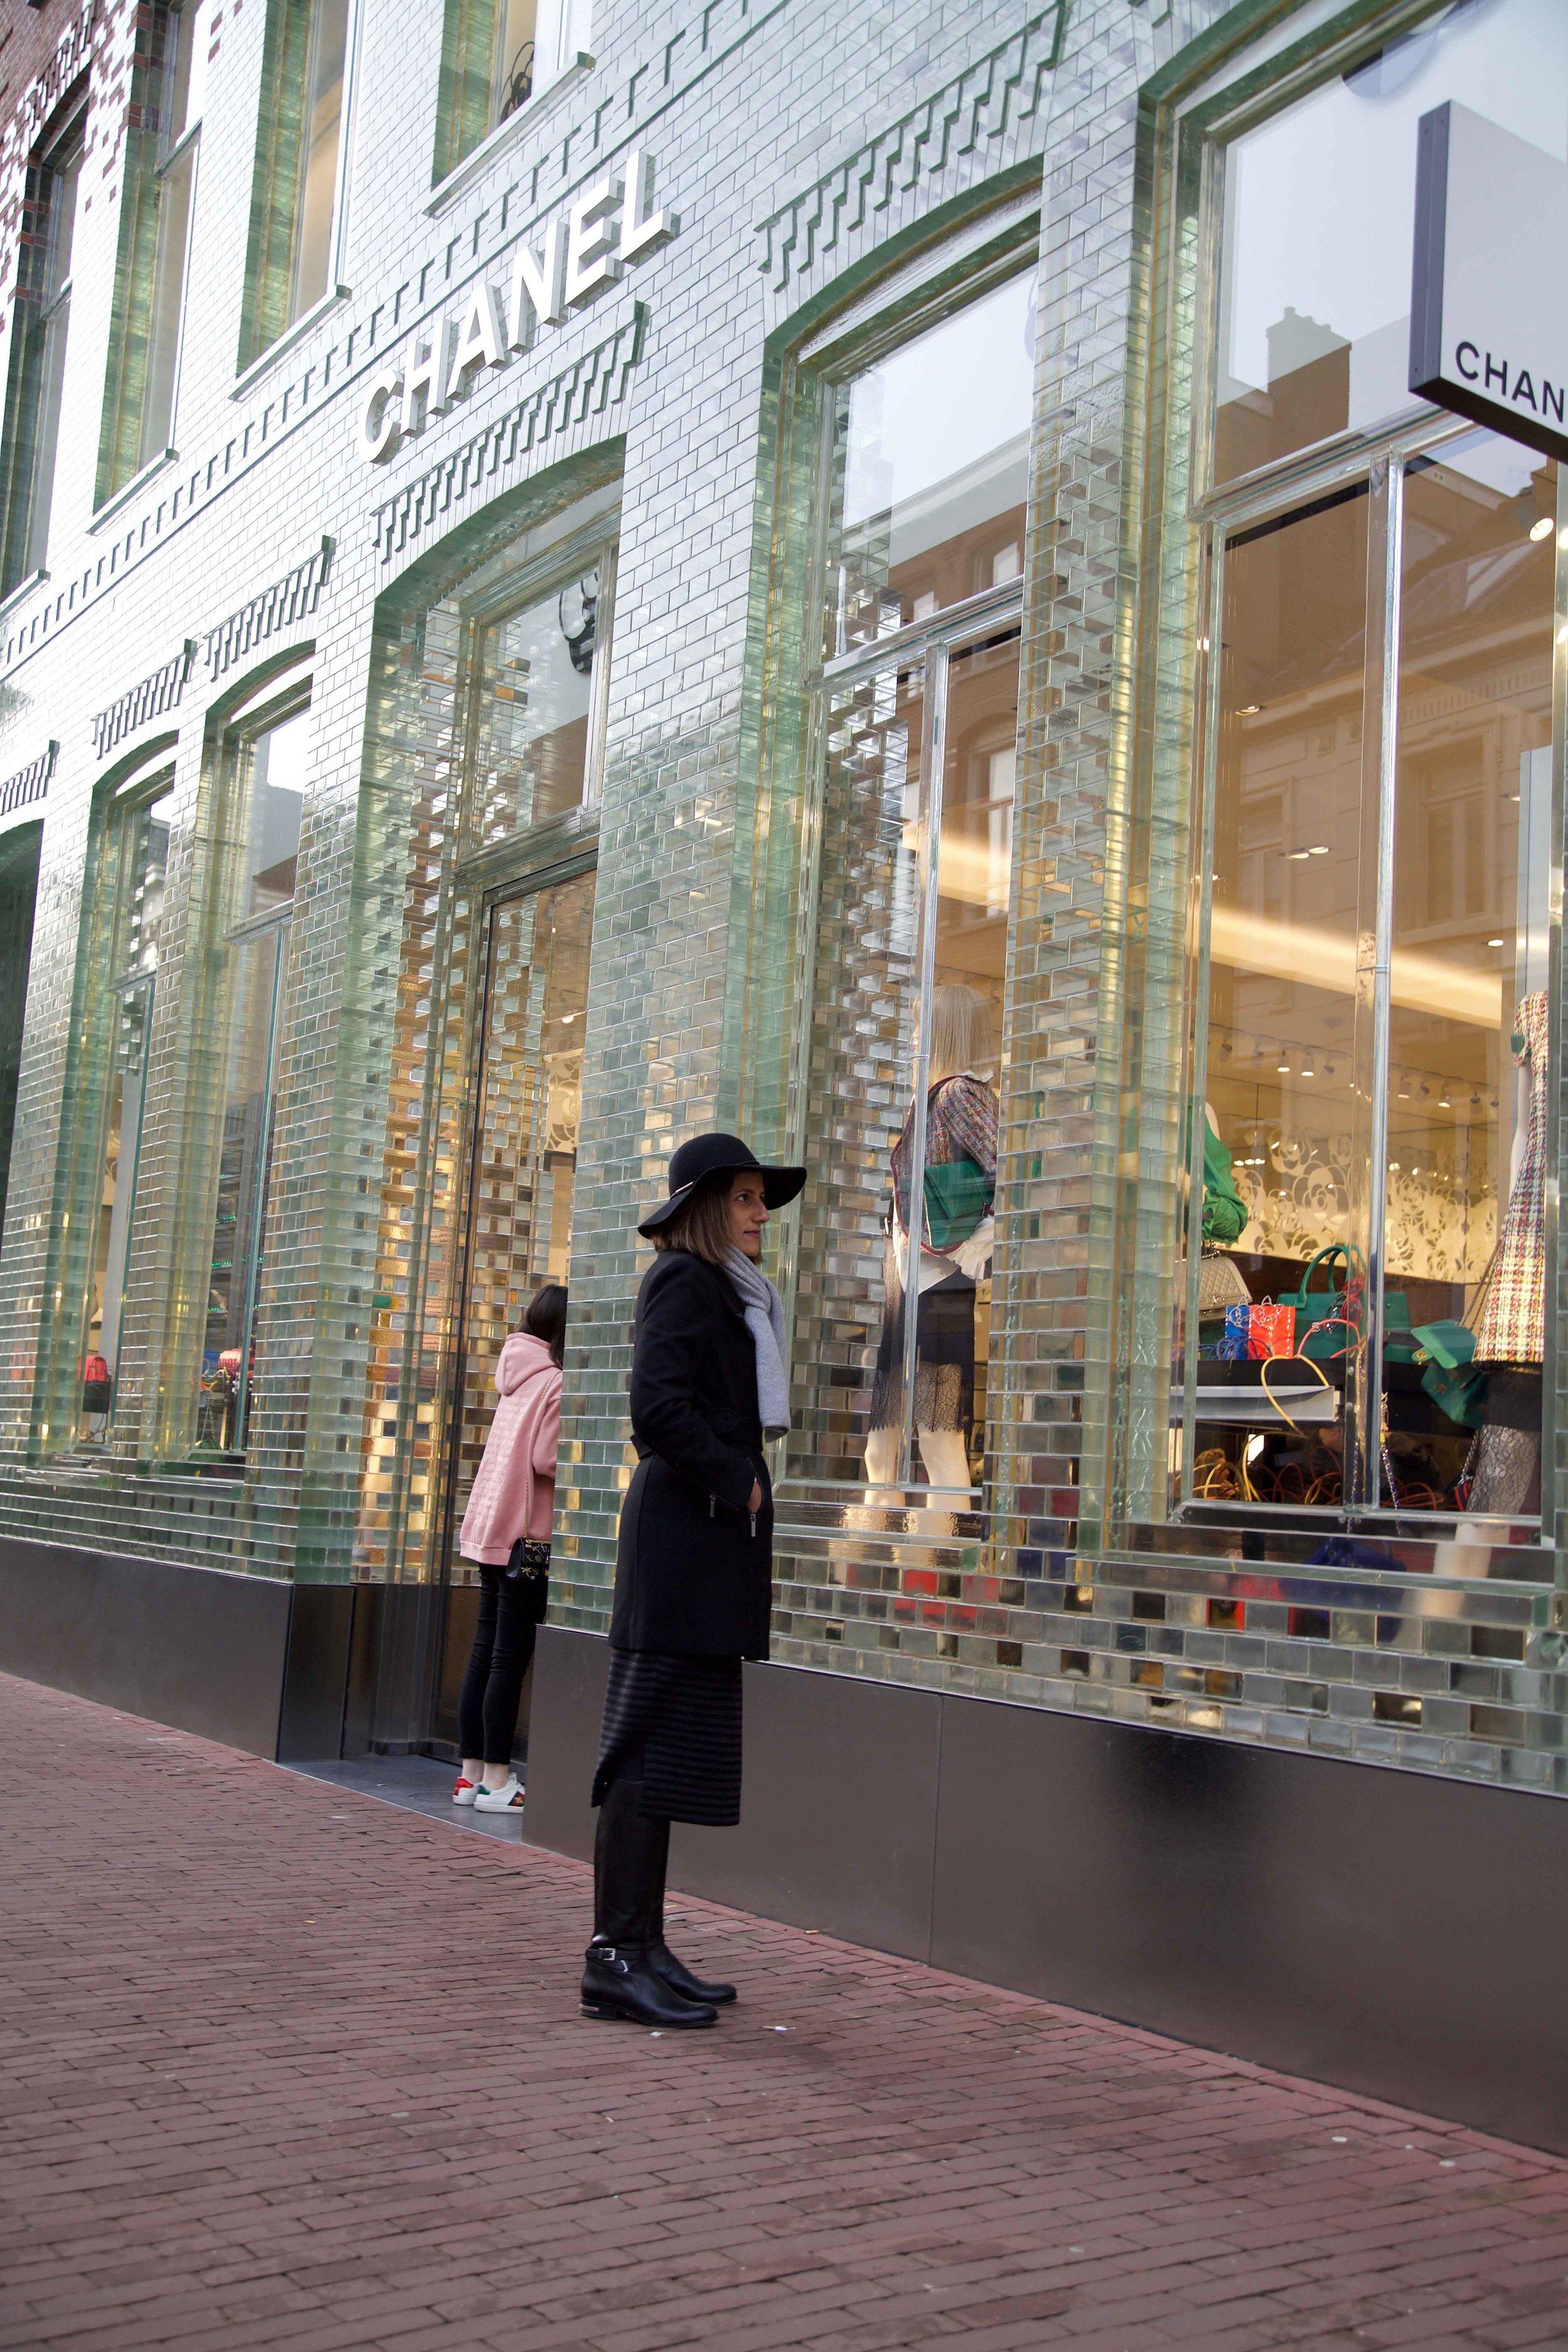 Chanel,Luxury shopping,PC Hooftstraat,Amsterdam. Photo: Fabio Ricci. Image©thingstodot.com